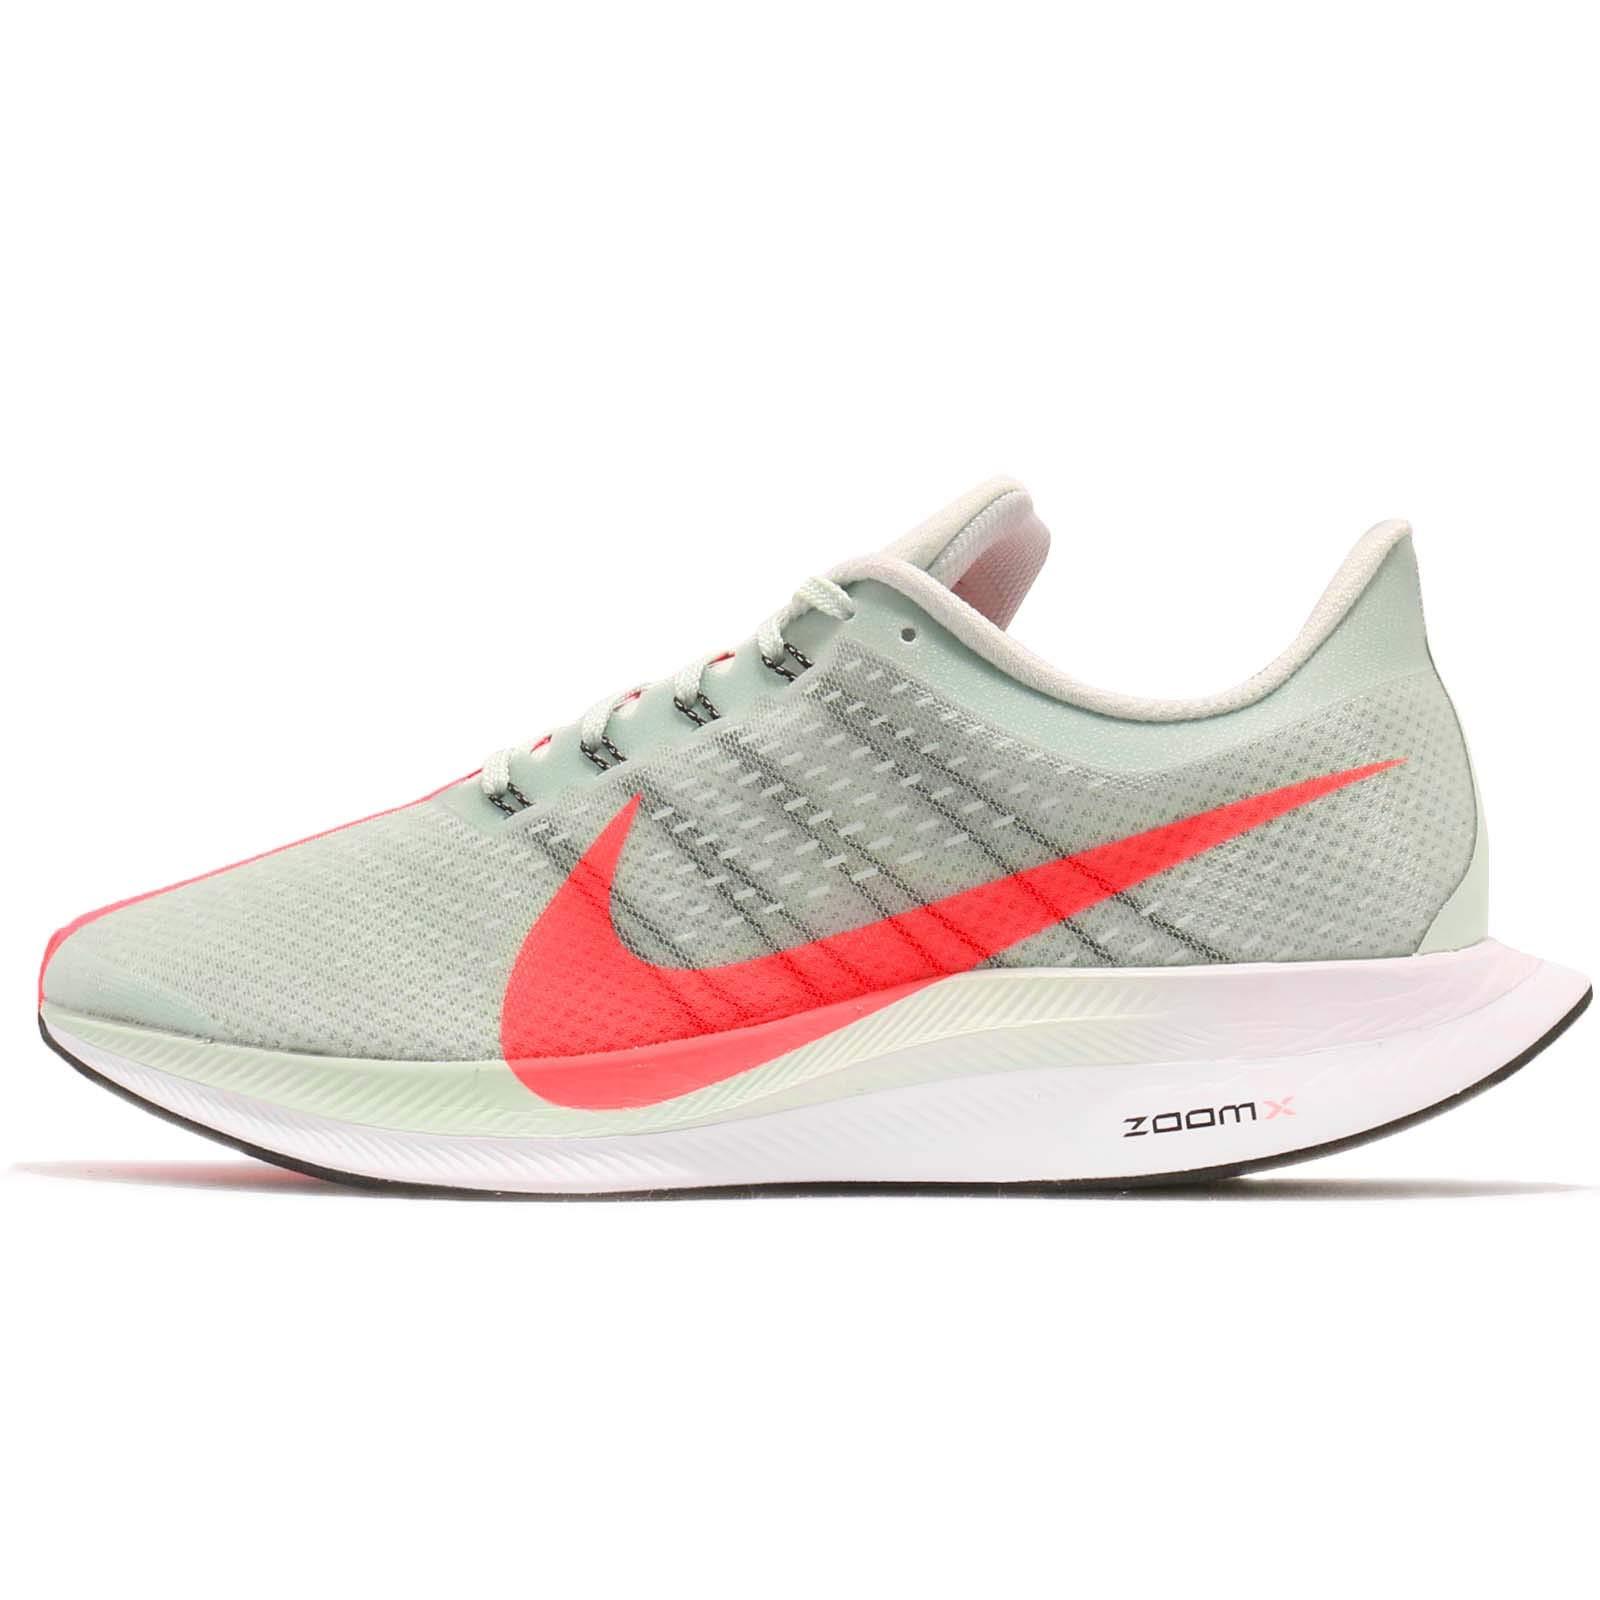 efe79b50c4118 Galleon - NIKE Men s Air Zoom Pegasus 35 Turbo Running Shoes